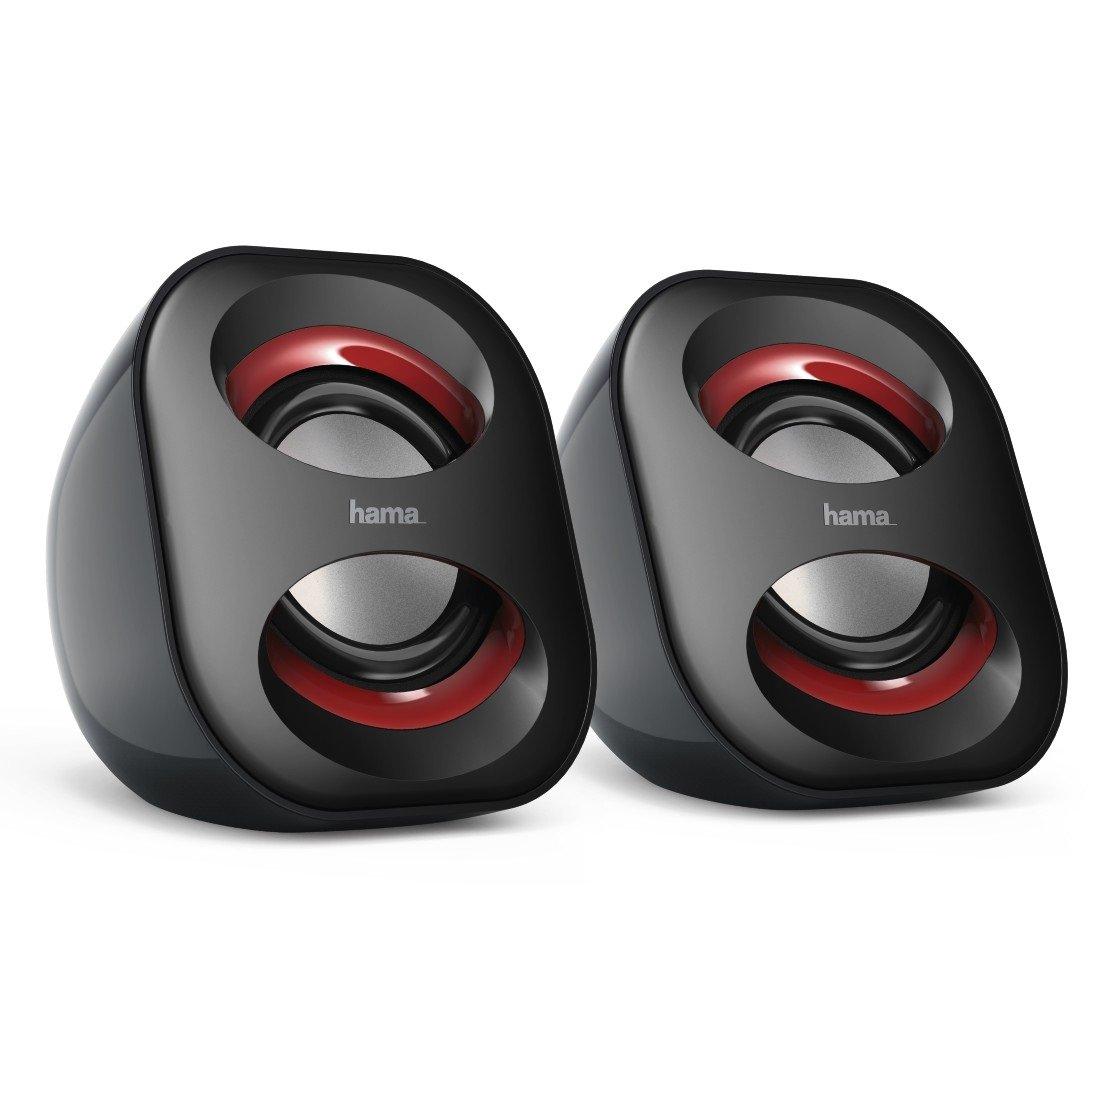 Hama 2.1 Soundsystem mit Fernbedienung (80W, fü r TV/PC/Mac, Aktiv-Boxen mit Subwoofer, Bluetooth, USB-Anschluss, SD-/MMC-Slot) Lautsprecher-System Schwarz/Rot Hama GmbH & Co KG 00173139